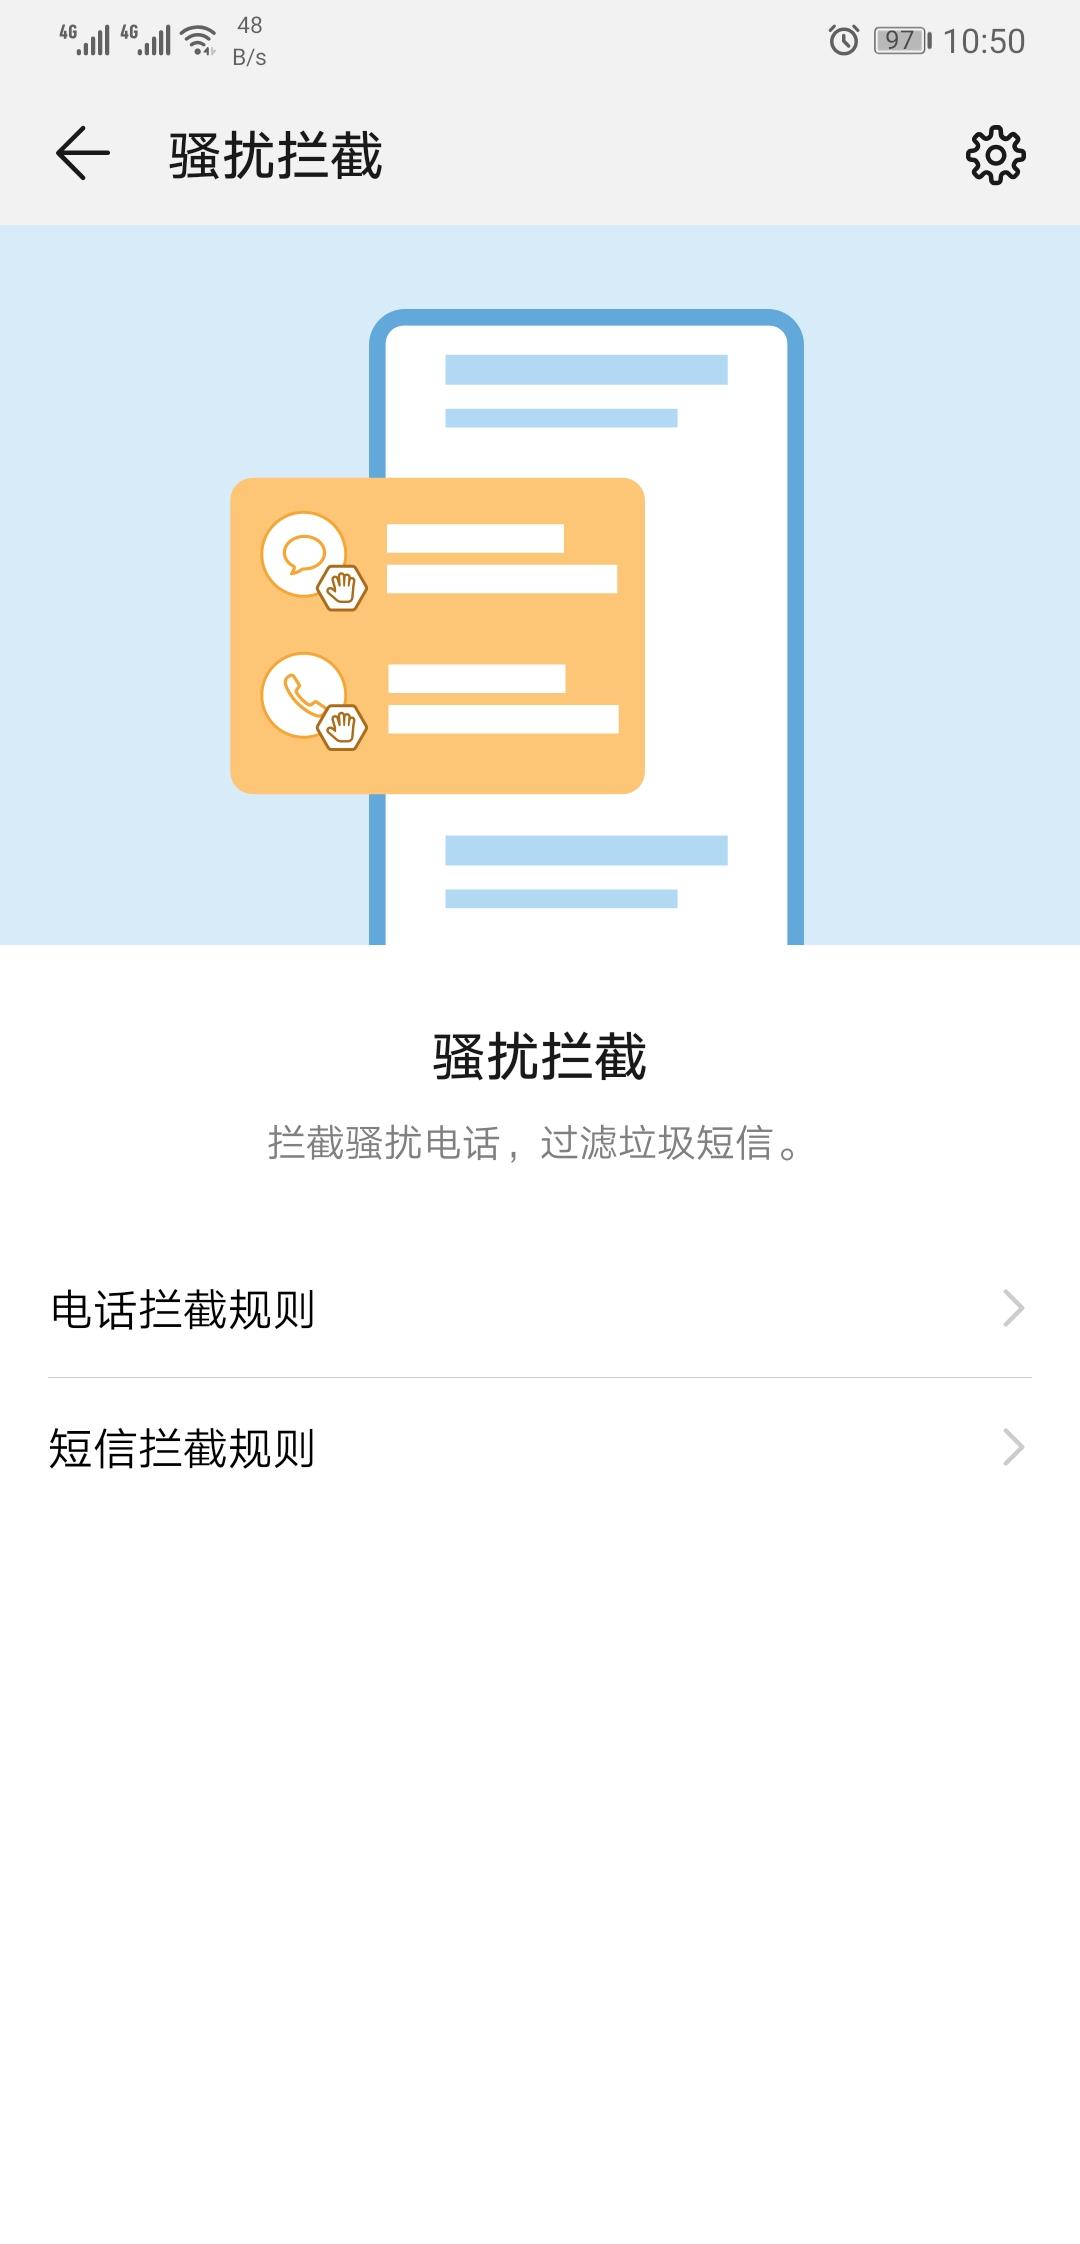 Screenshot_20181104_105001_com.huawei.systemmanag.jpg